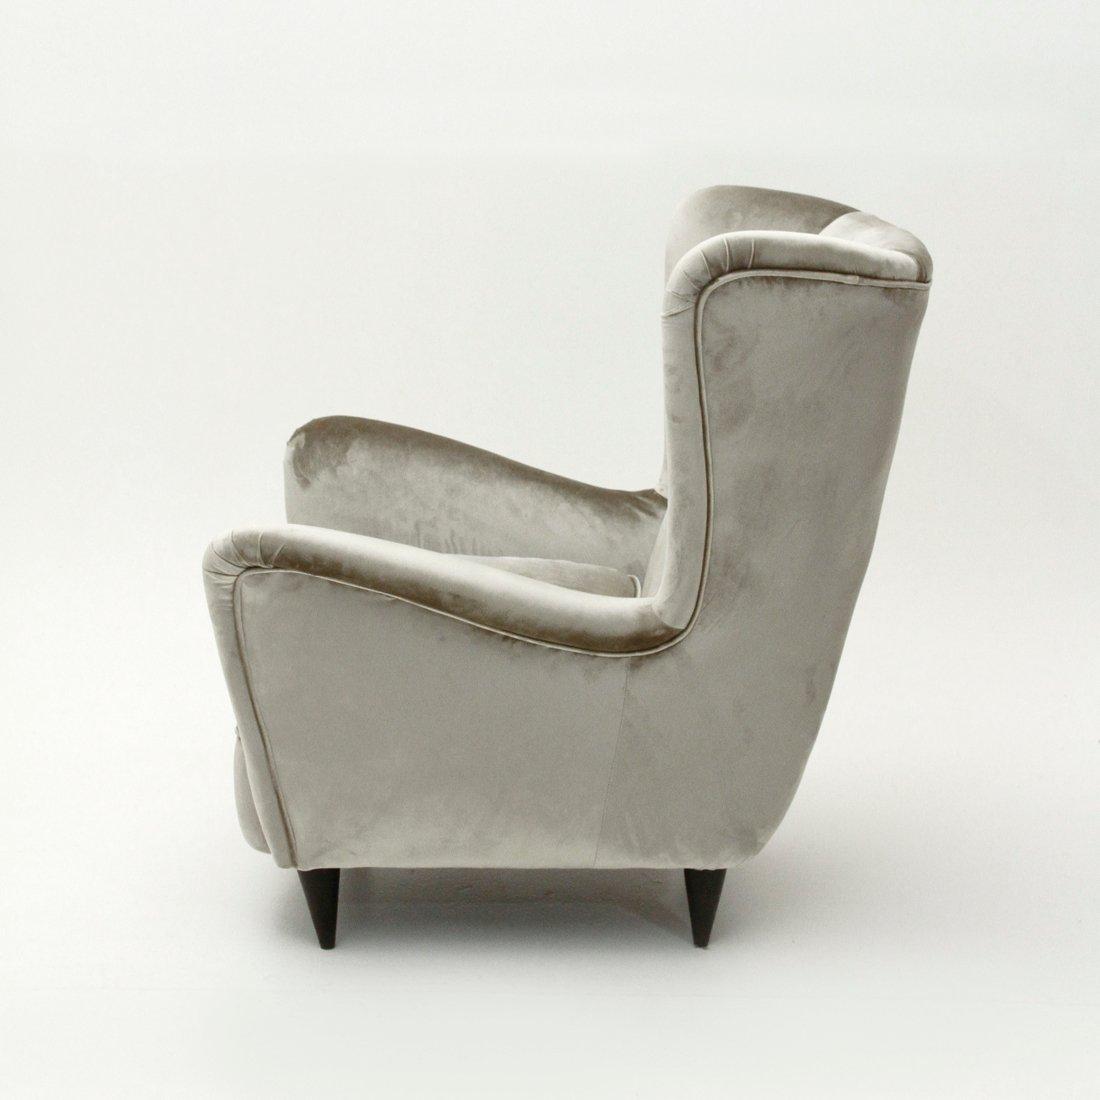 grauer samt sessel 1950er bei pamono kaufen. Black Bedroom Furniture Sets. Home Design Ideas